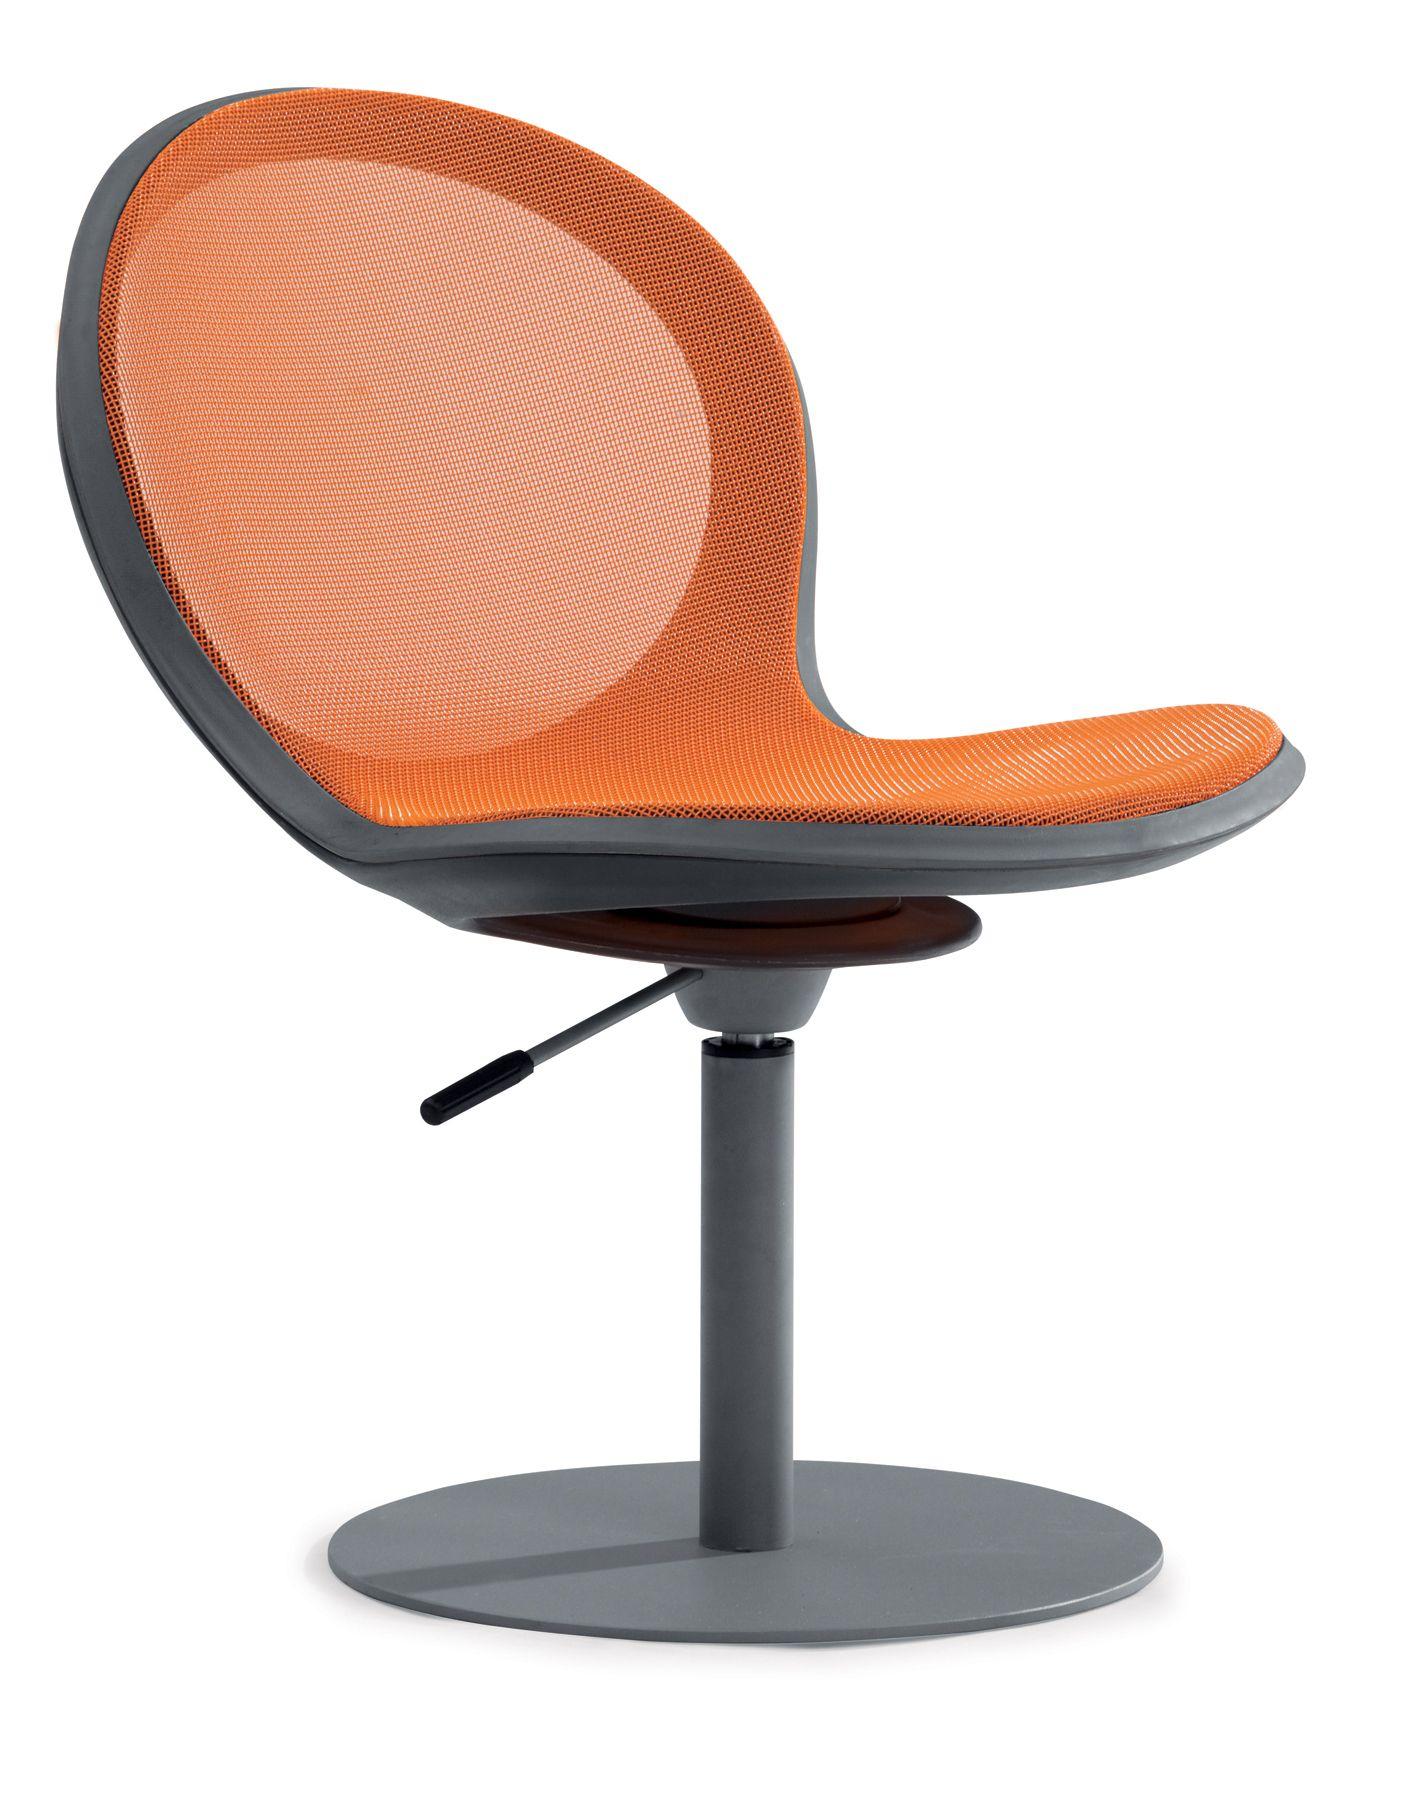 Fantastic Kids Desk Chair In Yellow Ofm Net Series Swivel Chair Machost Co Dining Chair Design Ideas Machostcouk